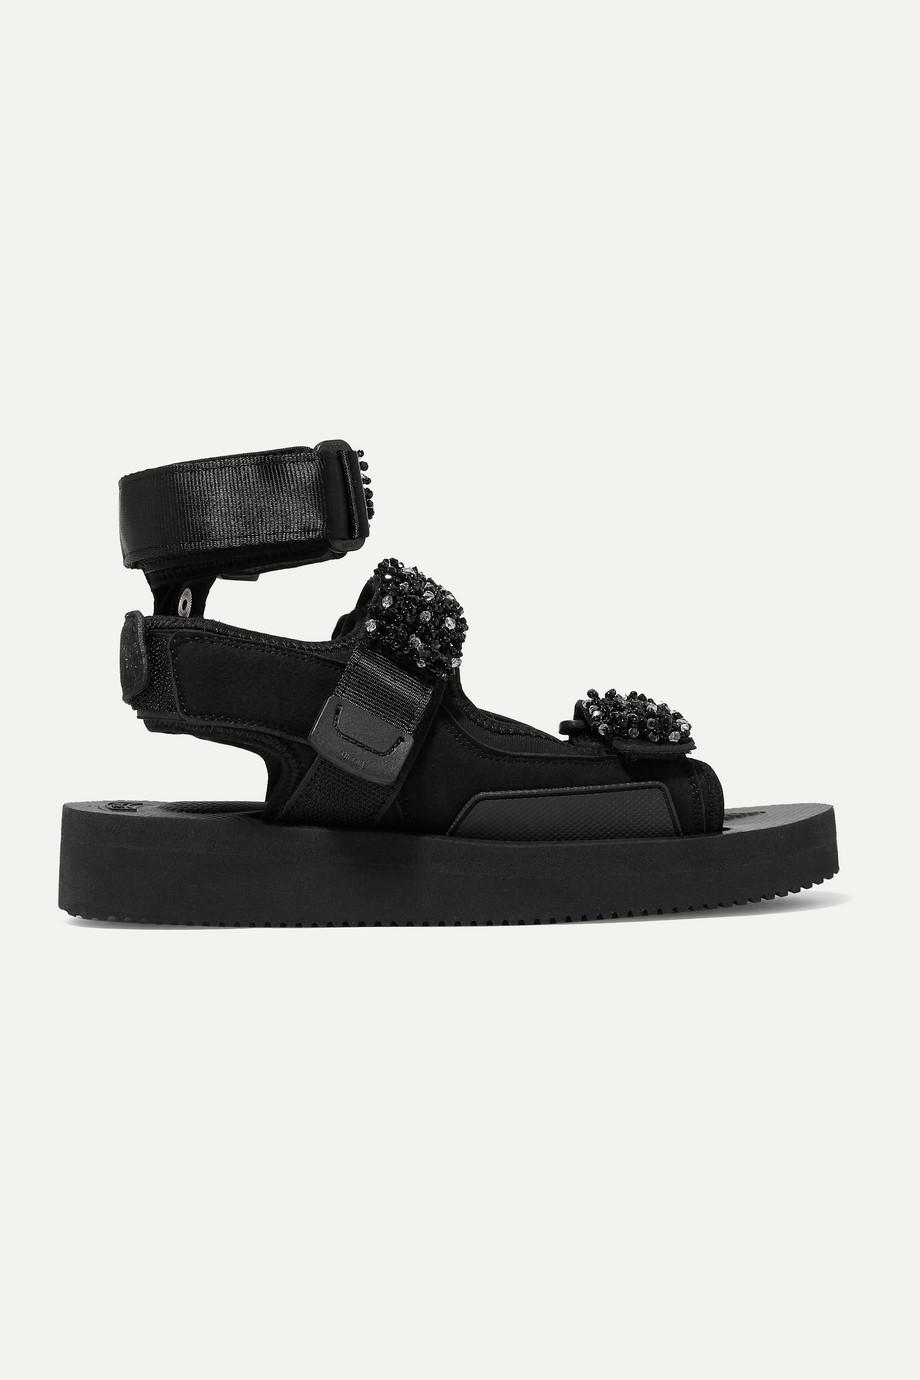 Cecilie Bahnsen + Suicoke Aurelia bead-embellished neoprene sandals